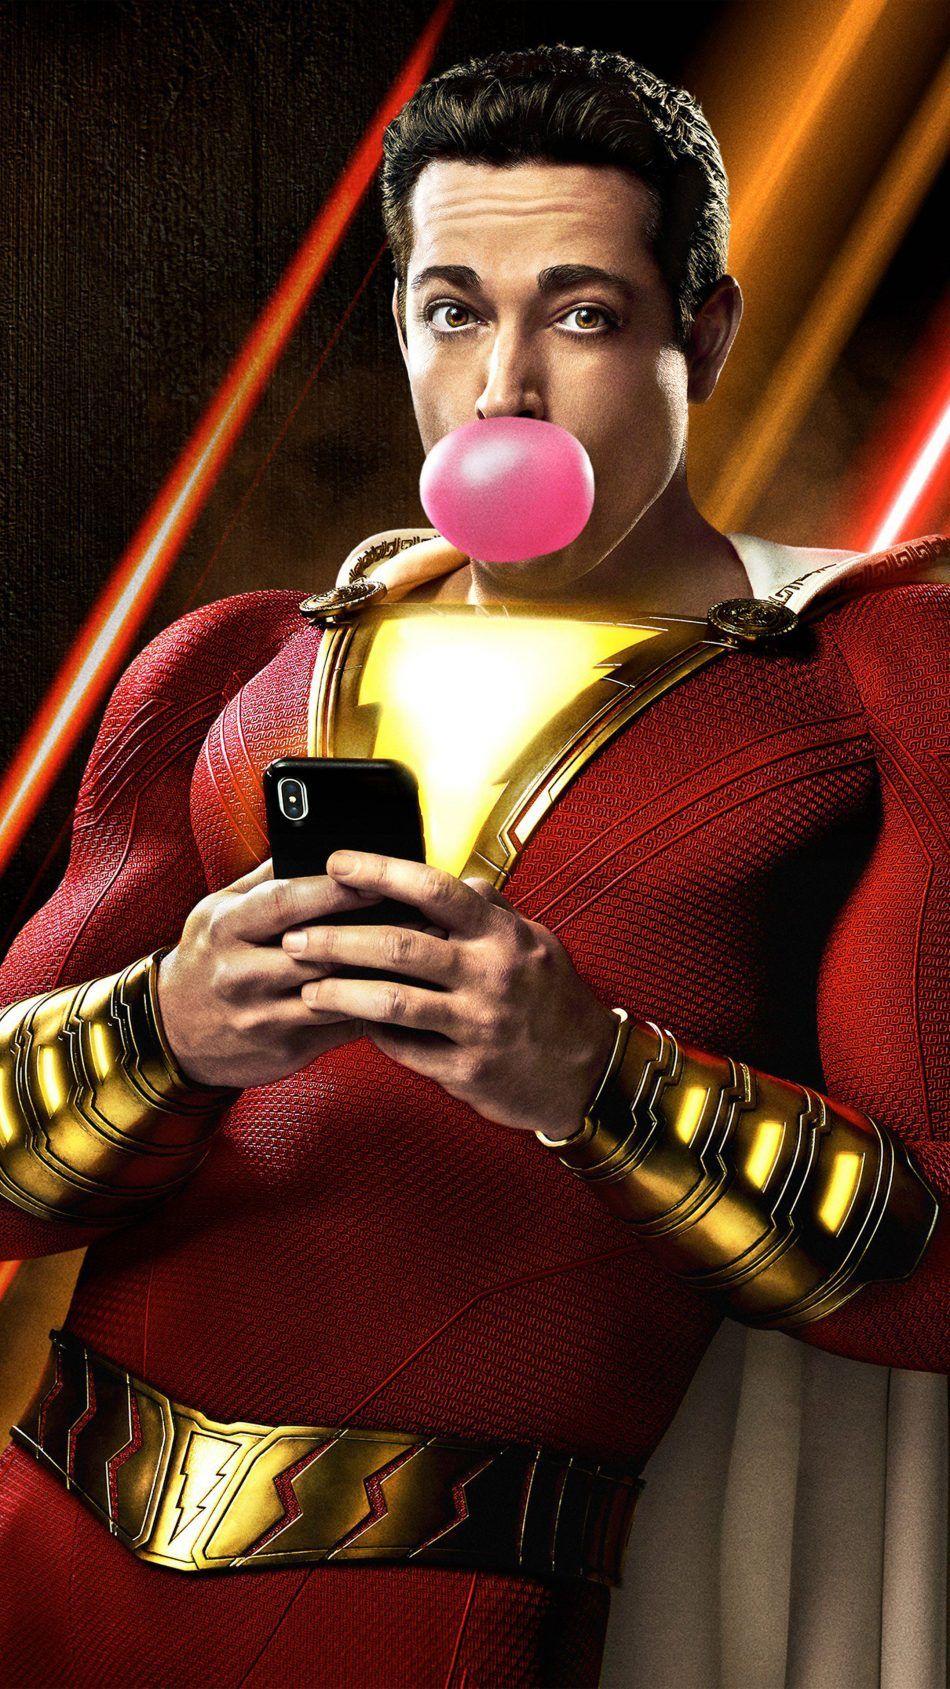 Zachary Levi In Shazam Comics 2019 Movie Wallpapers Pinterest